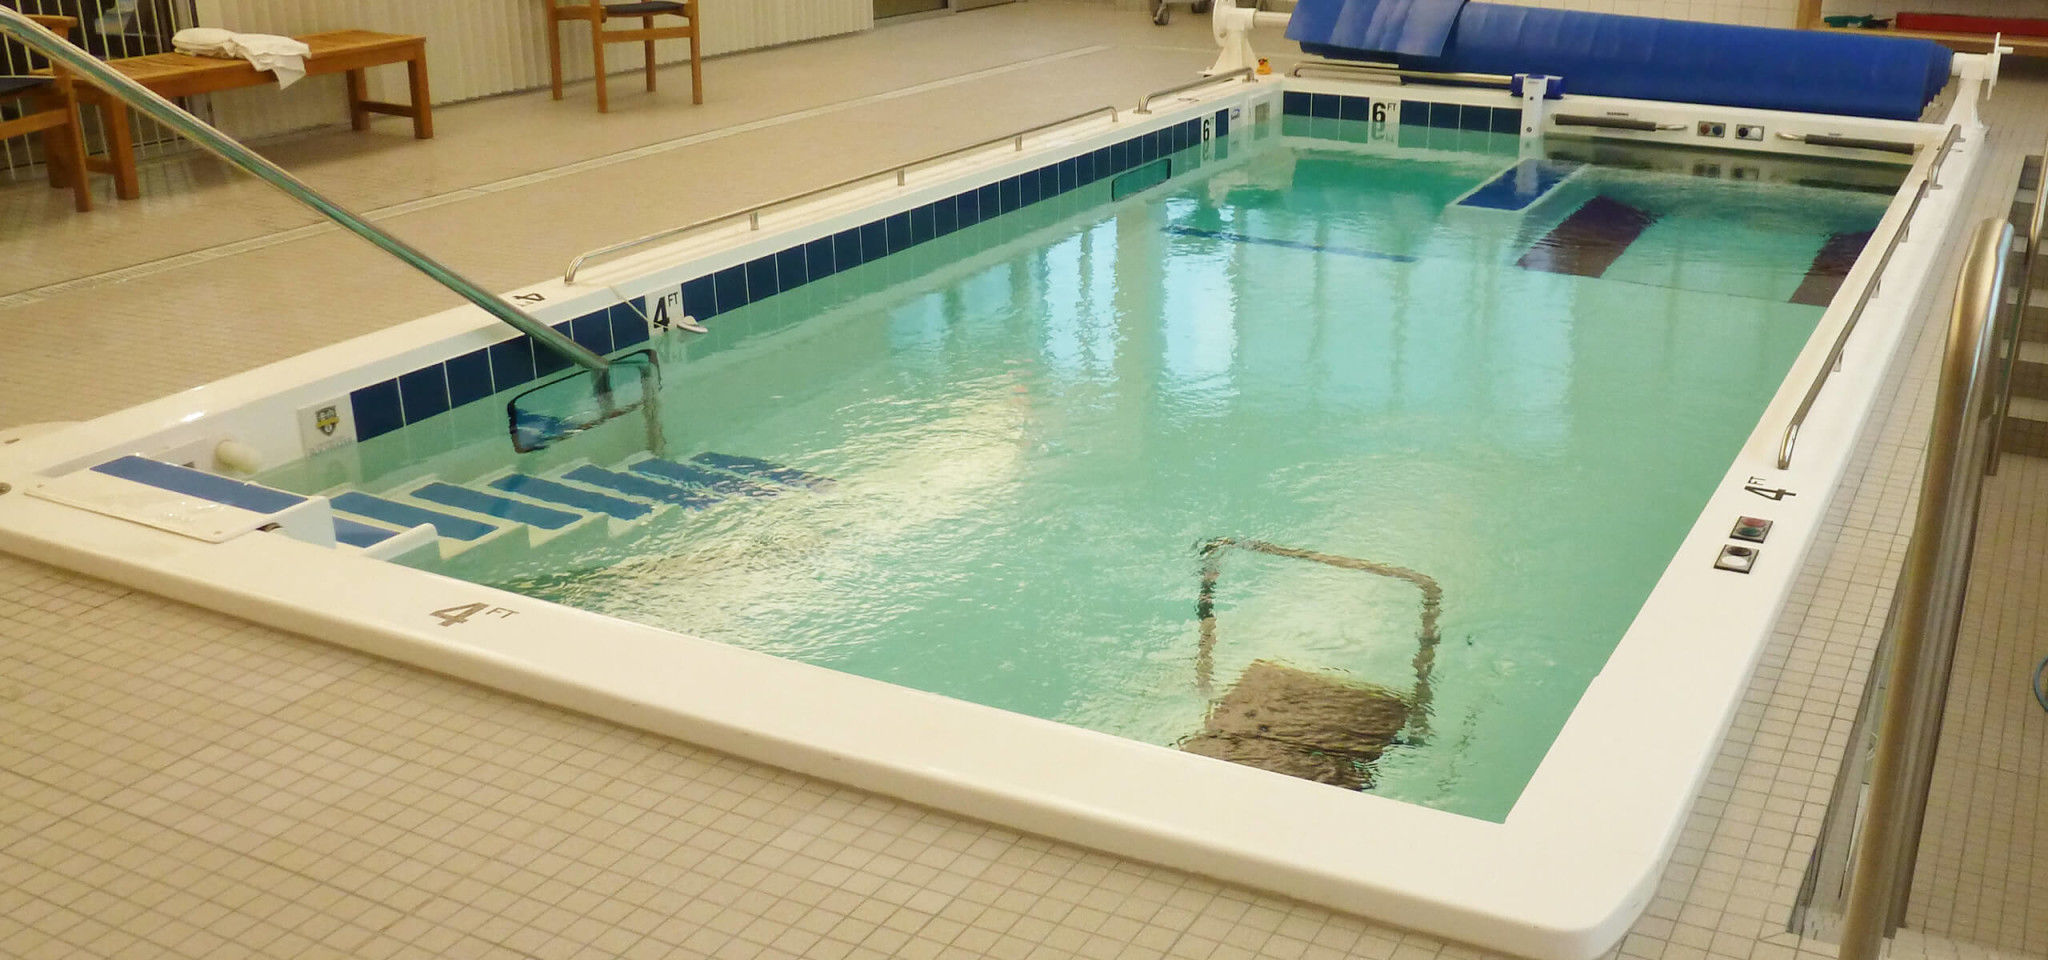 Rehabilitation swimming pool - 1000 T - SwimEx - Videos